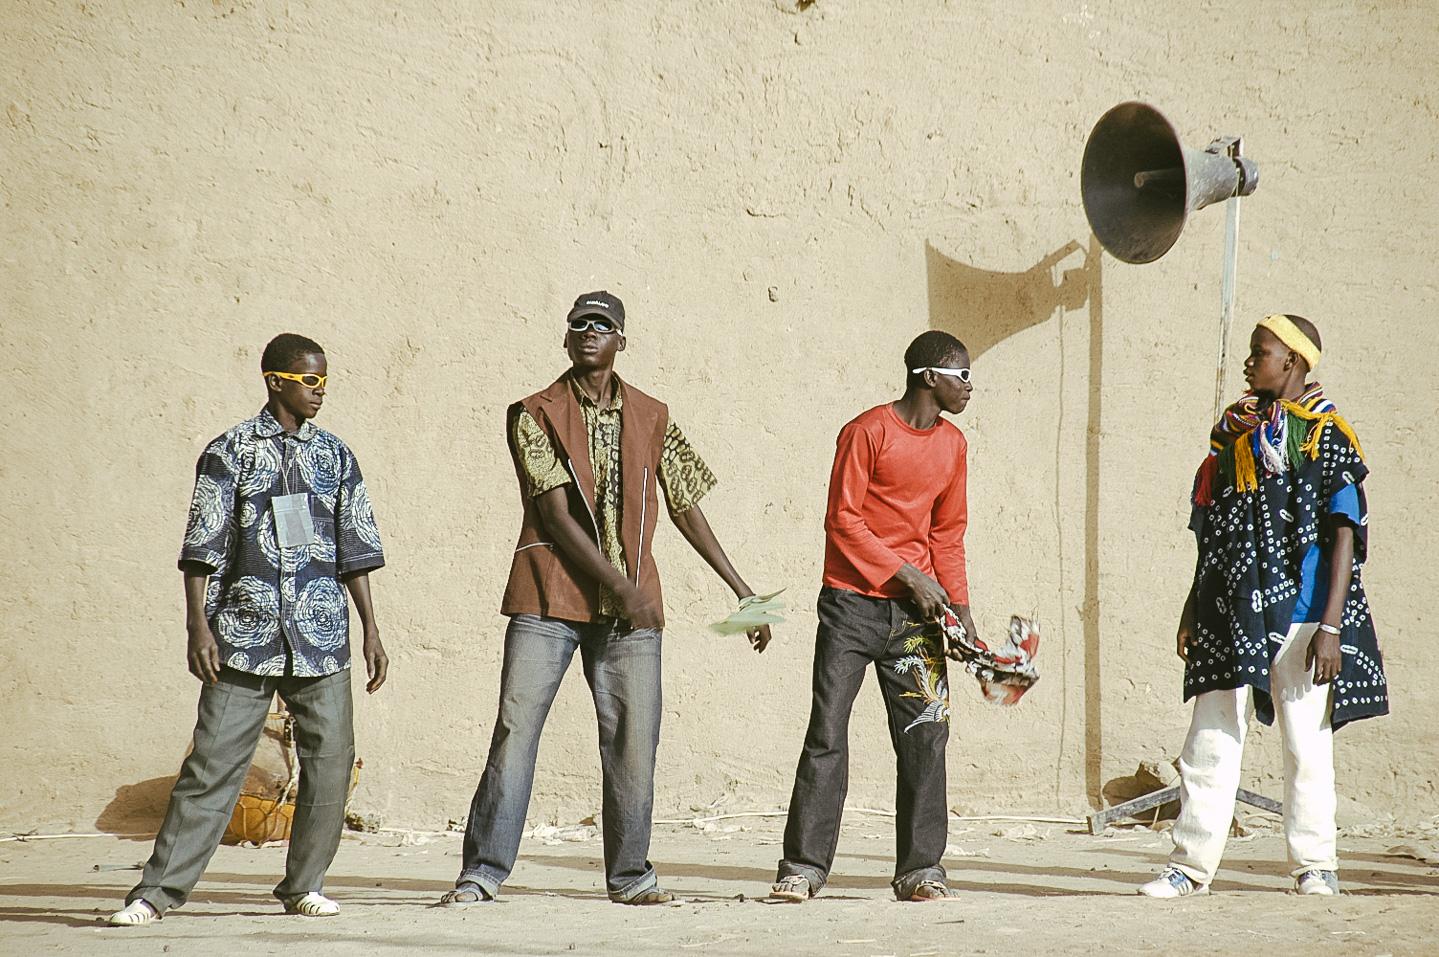 Rund um Afrika - Mali - Westafrika - Transafrika-432